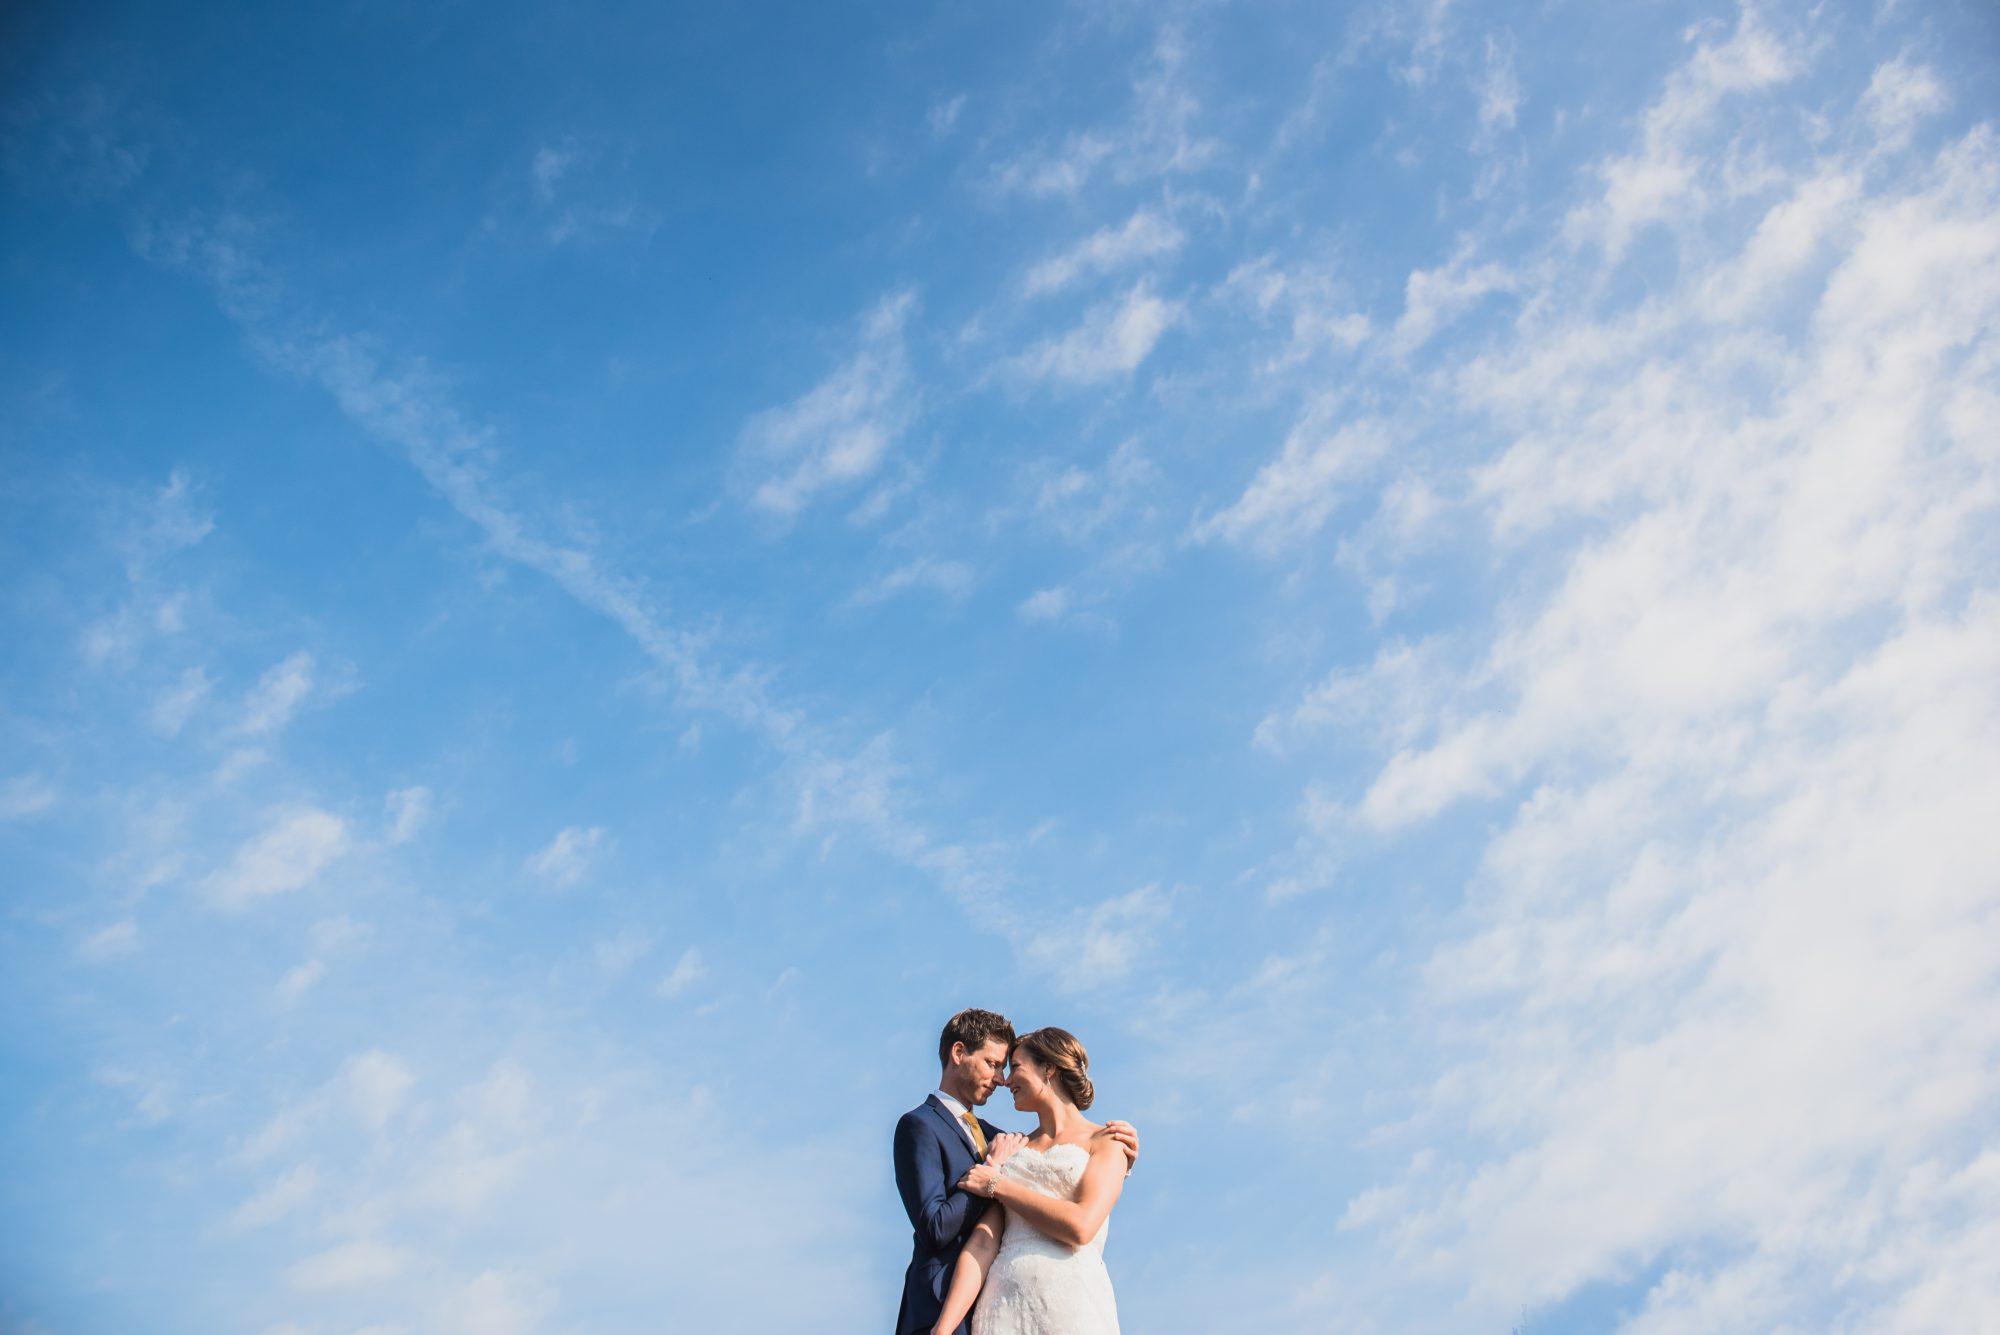 bruiloft-roland-annewil-192